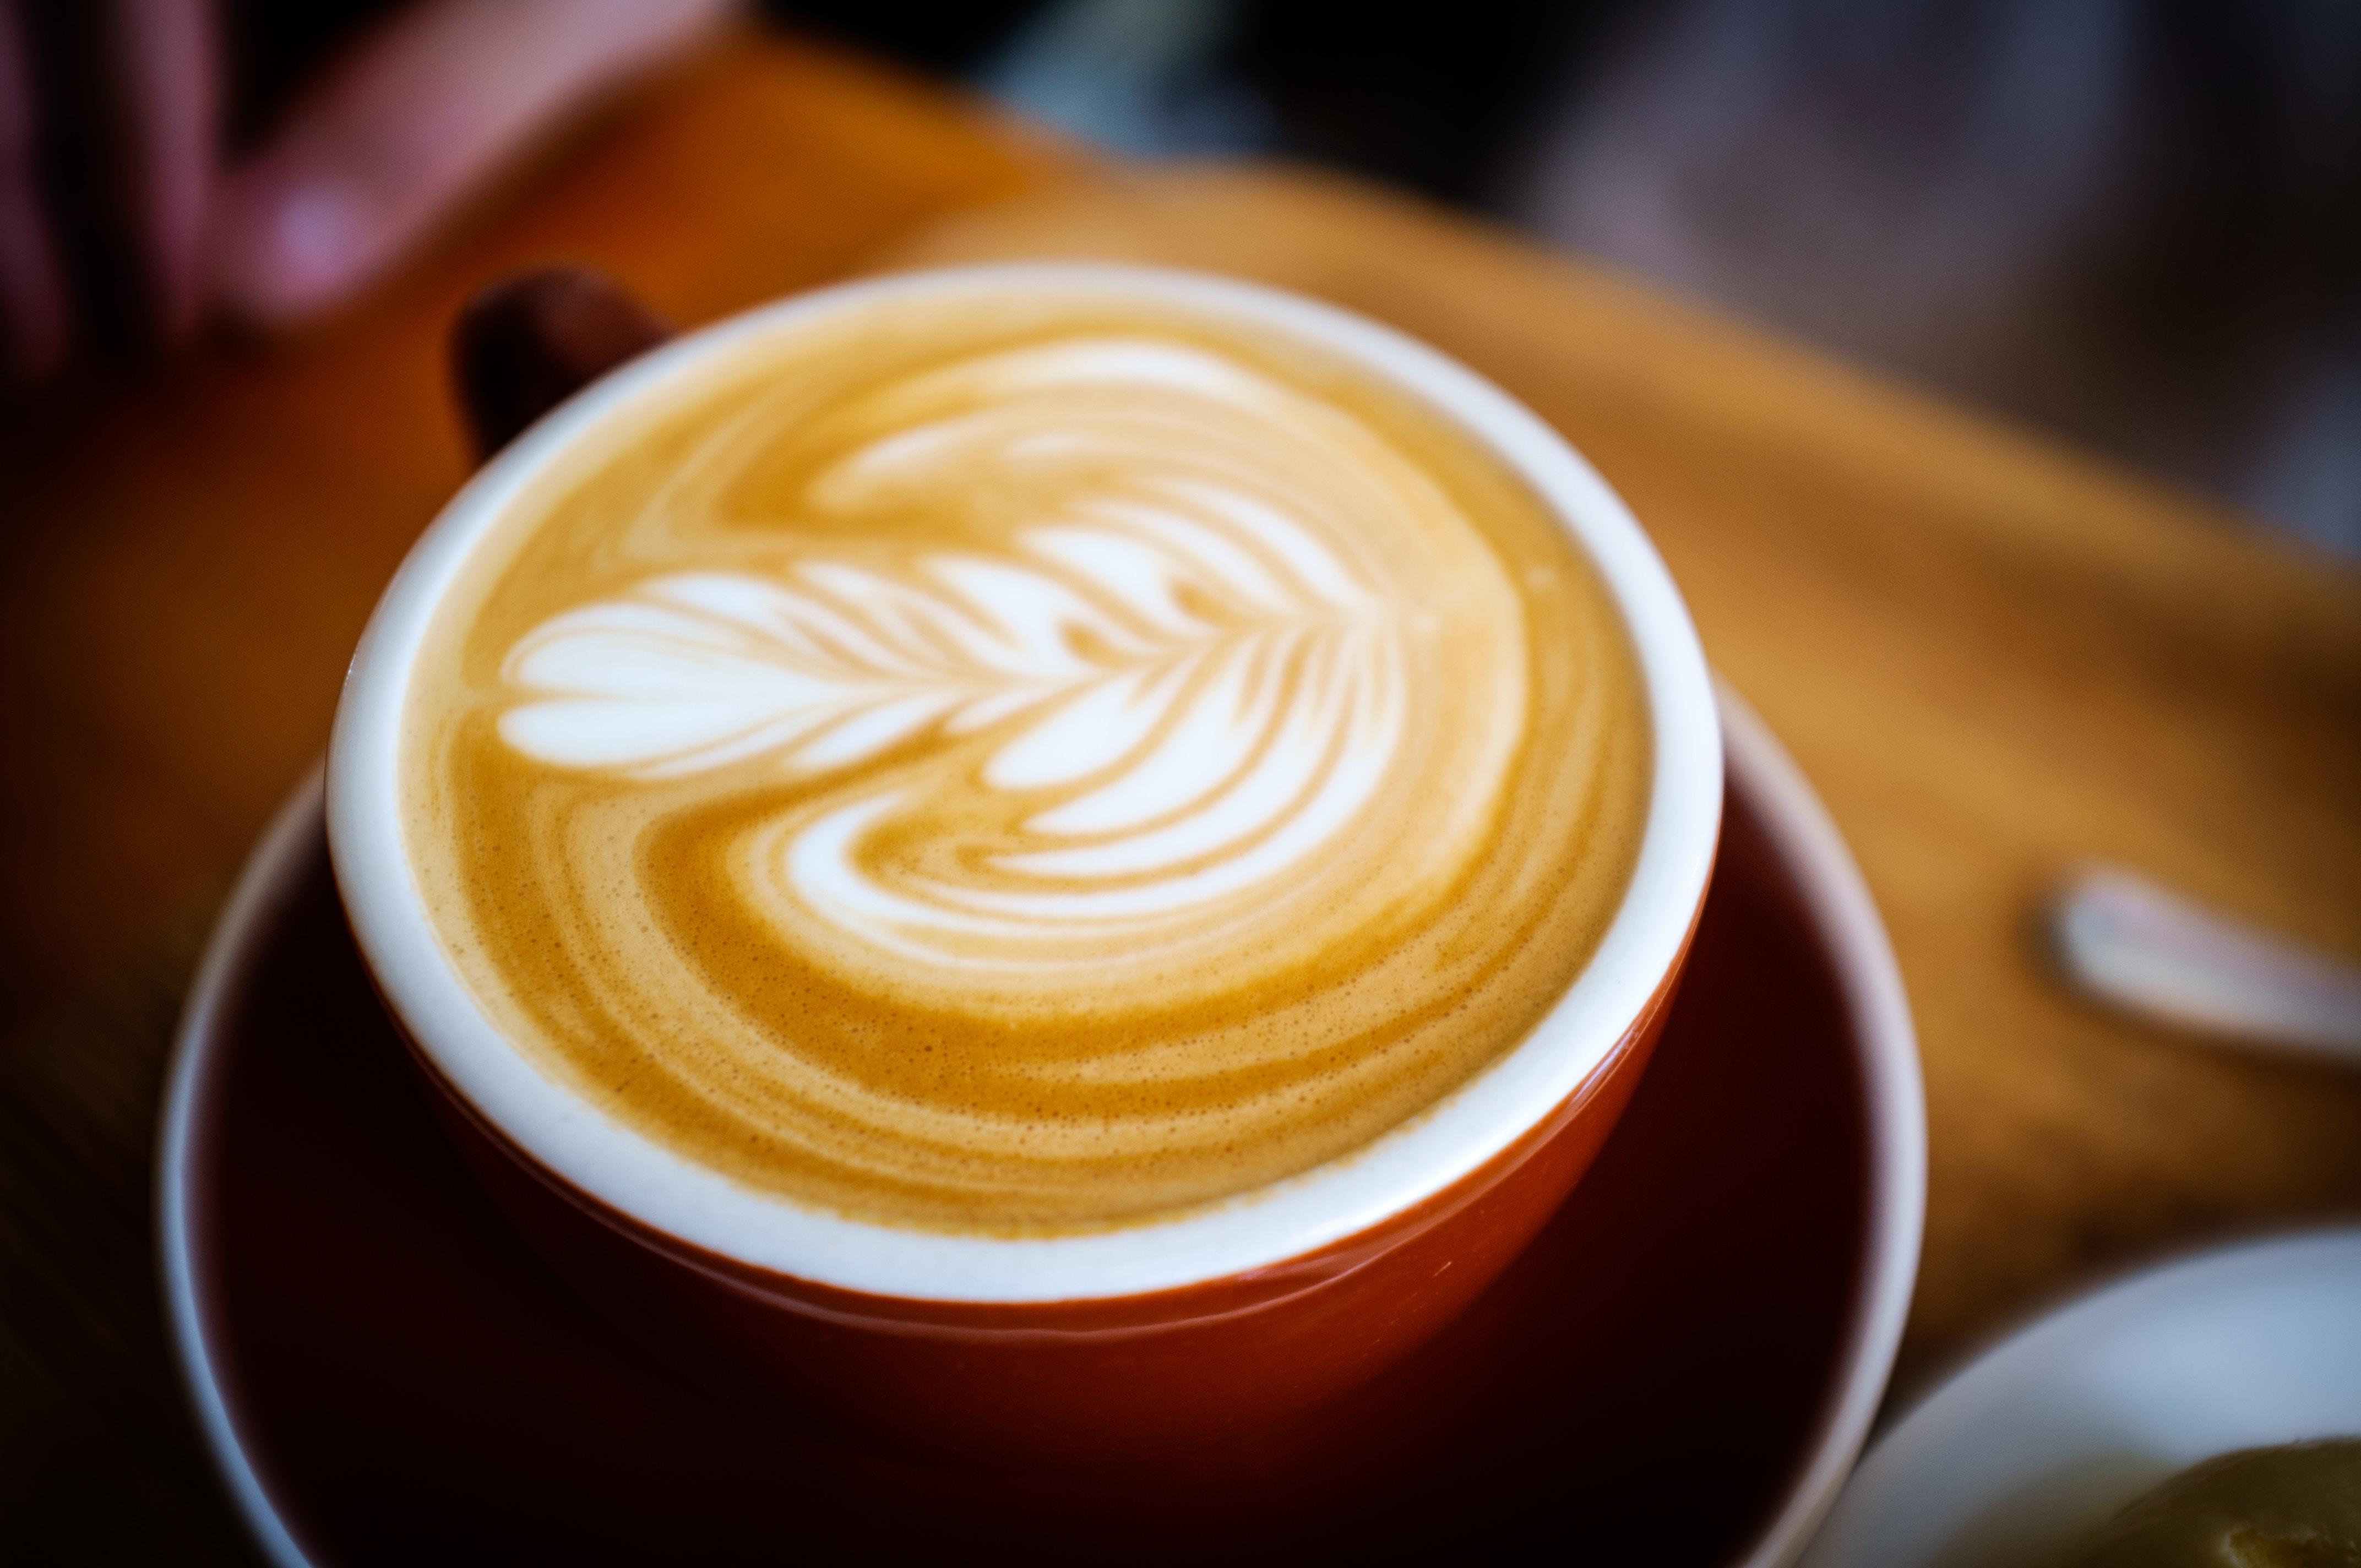 ceramic coffee mug filled with coffee